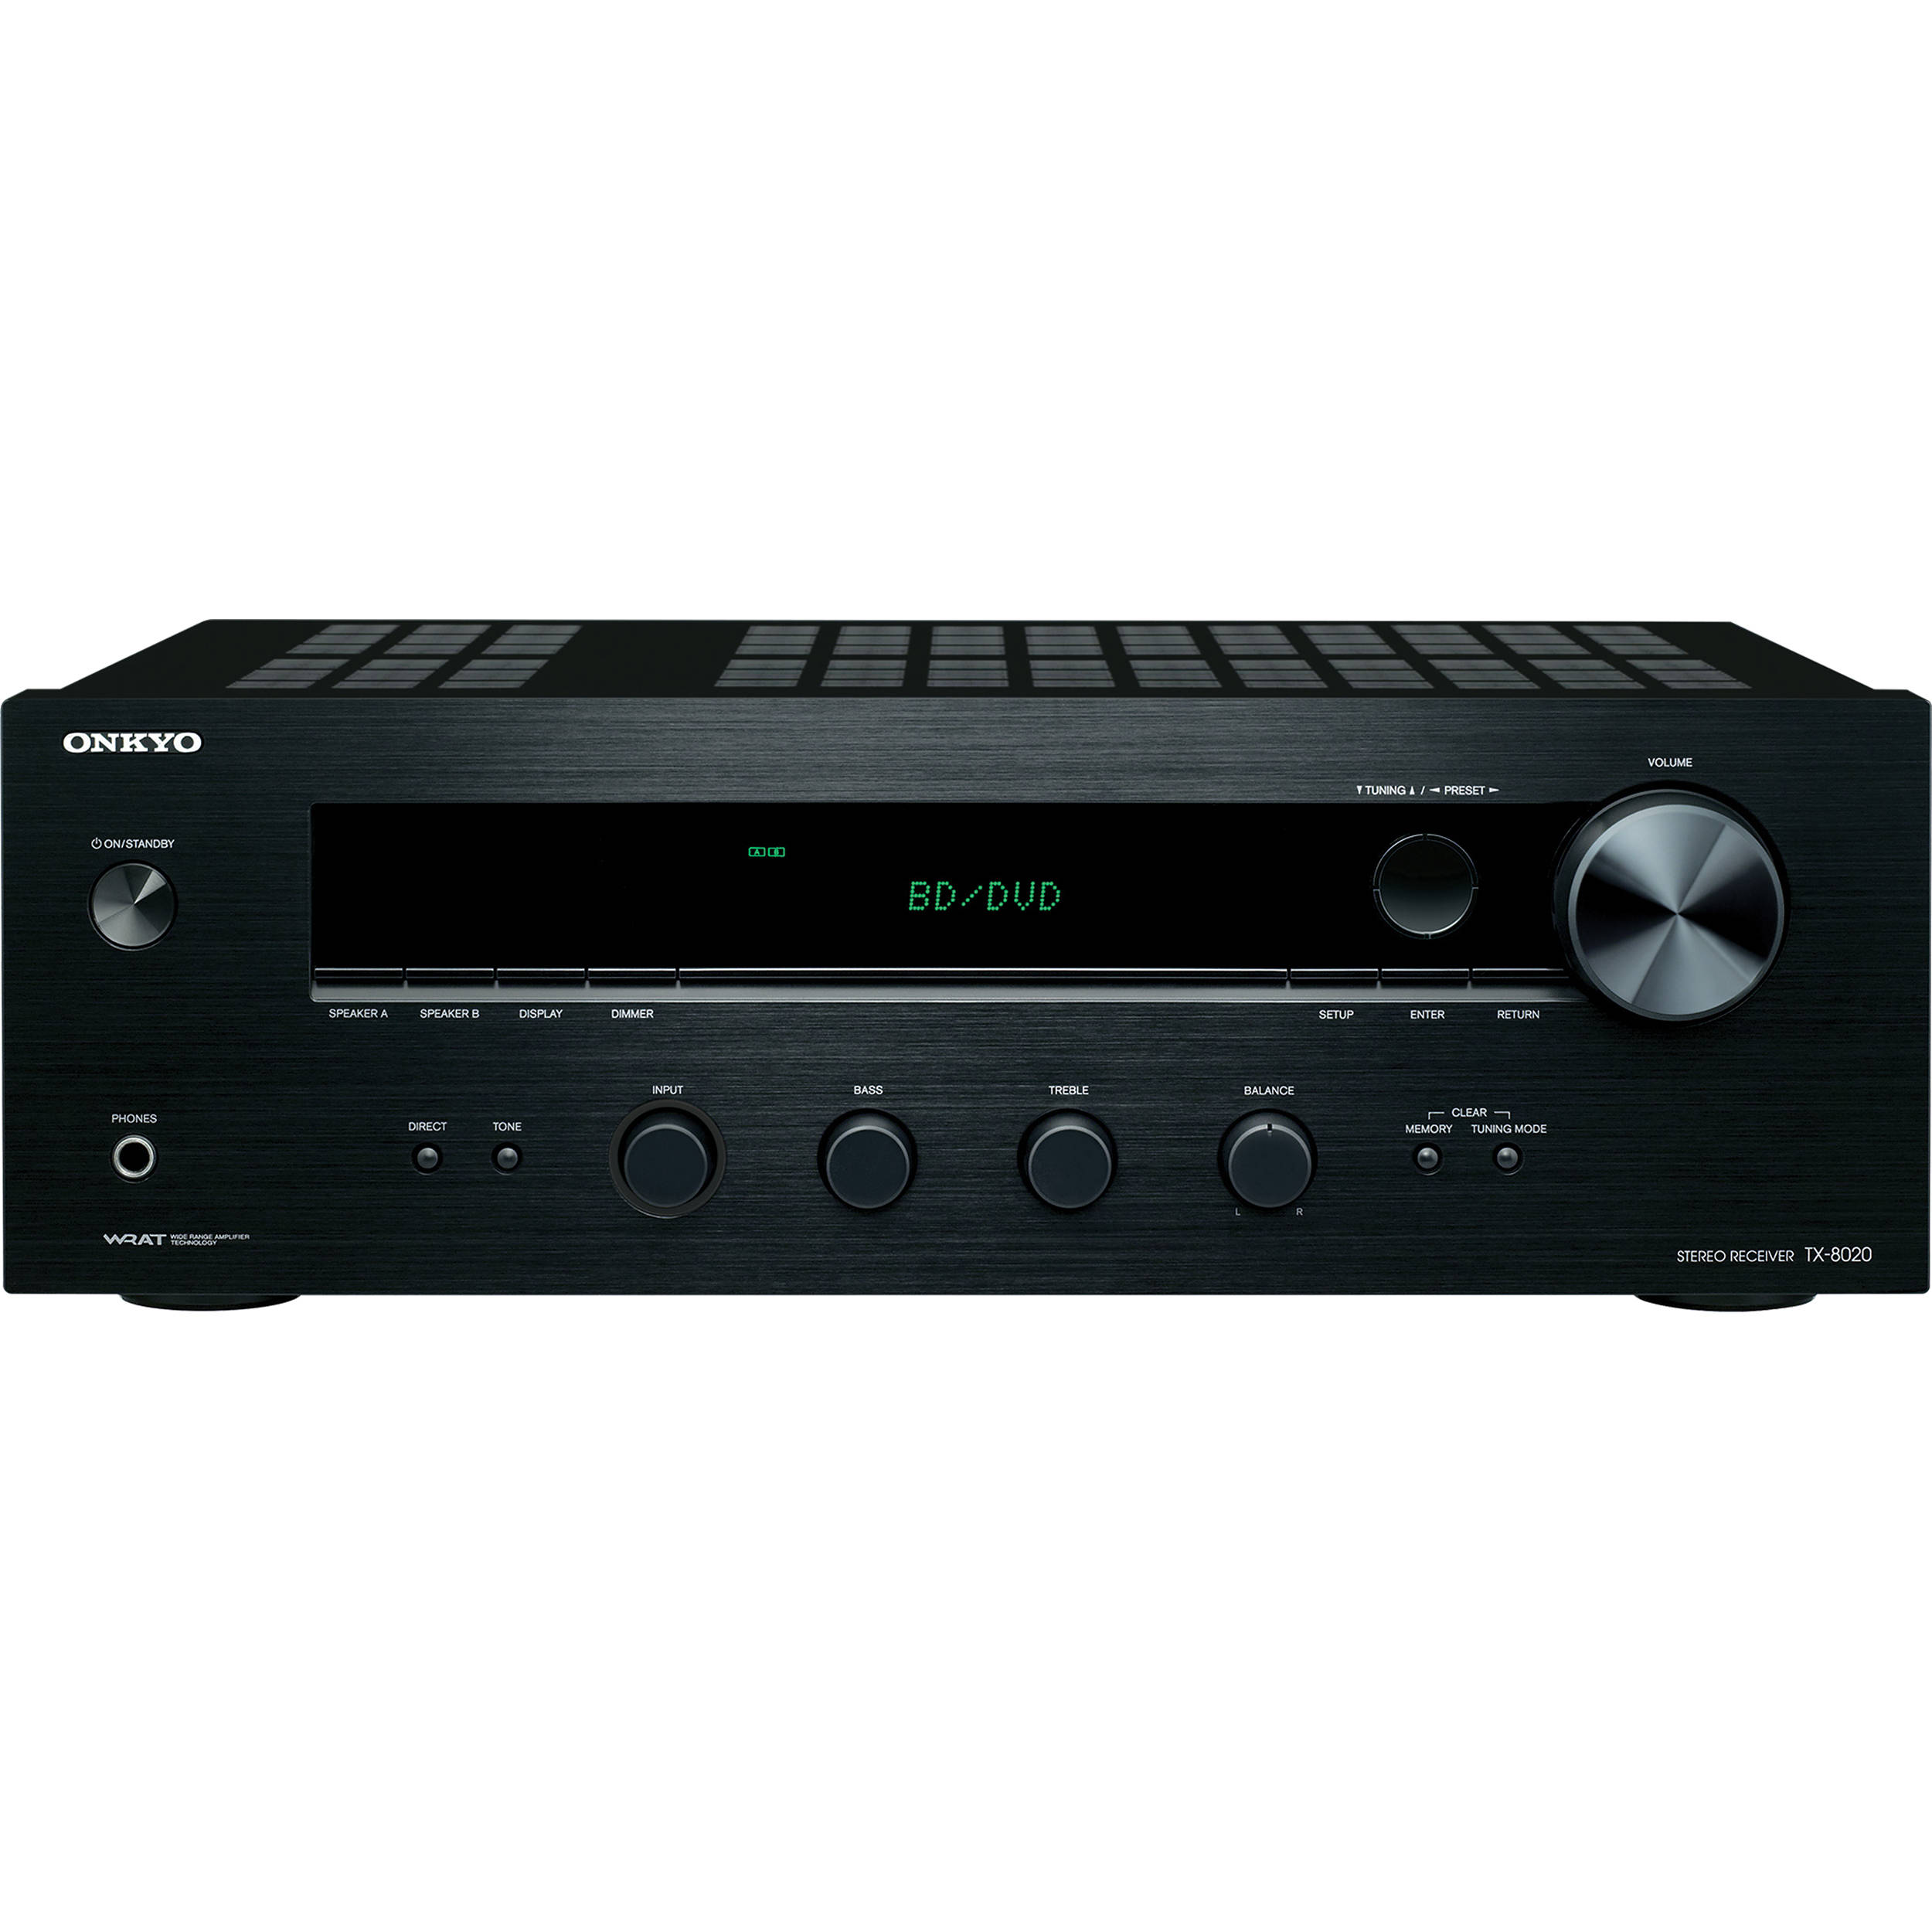 Onkyo Tx 8020 Stereo Receiver